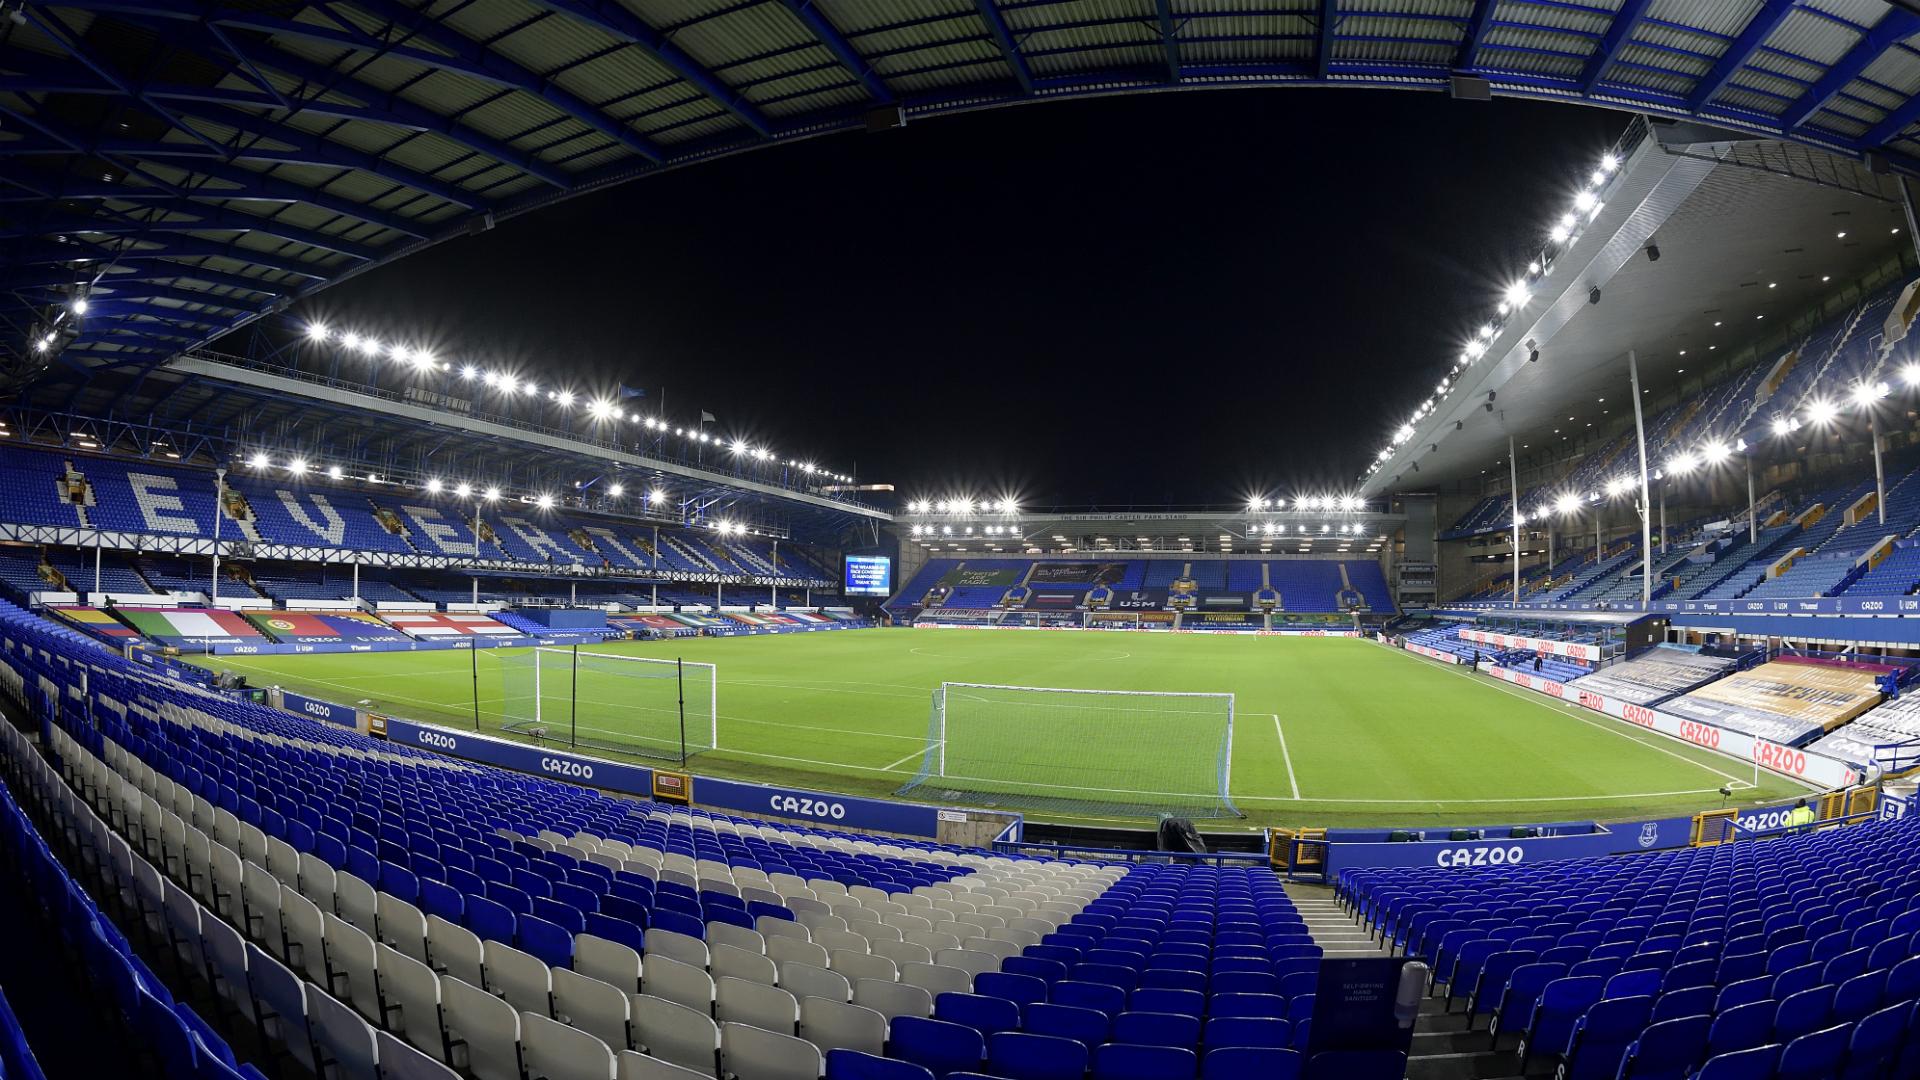 Coronavirus: Everton request full disclosure from Premier League after Manchester City postponement